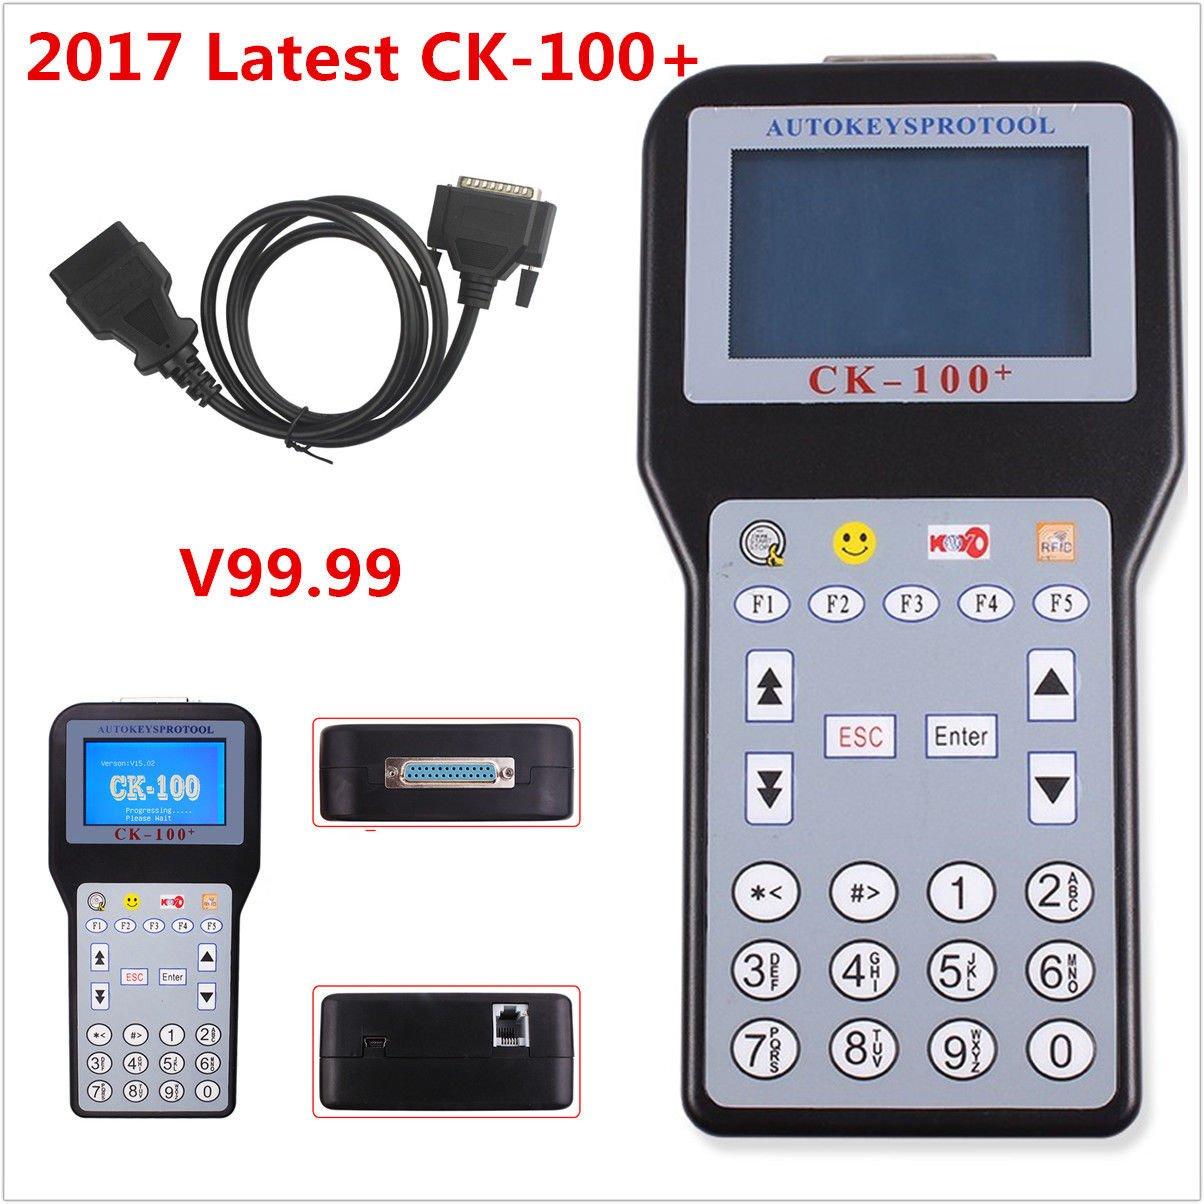 2017 Latest CK-100+ Car Key Programmer V99.99 Generation Multi-language SBB Tool